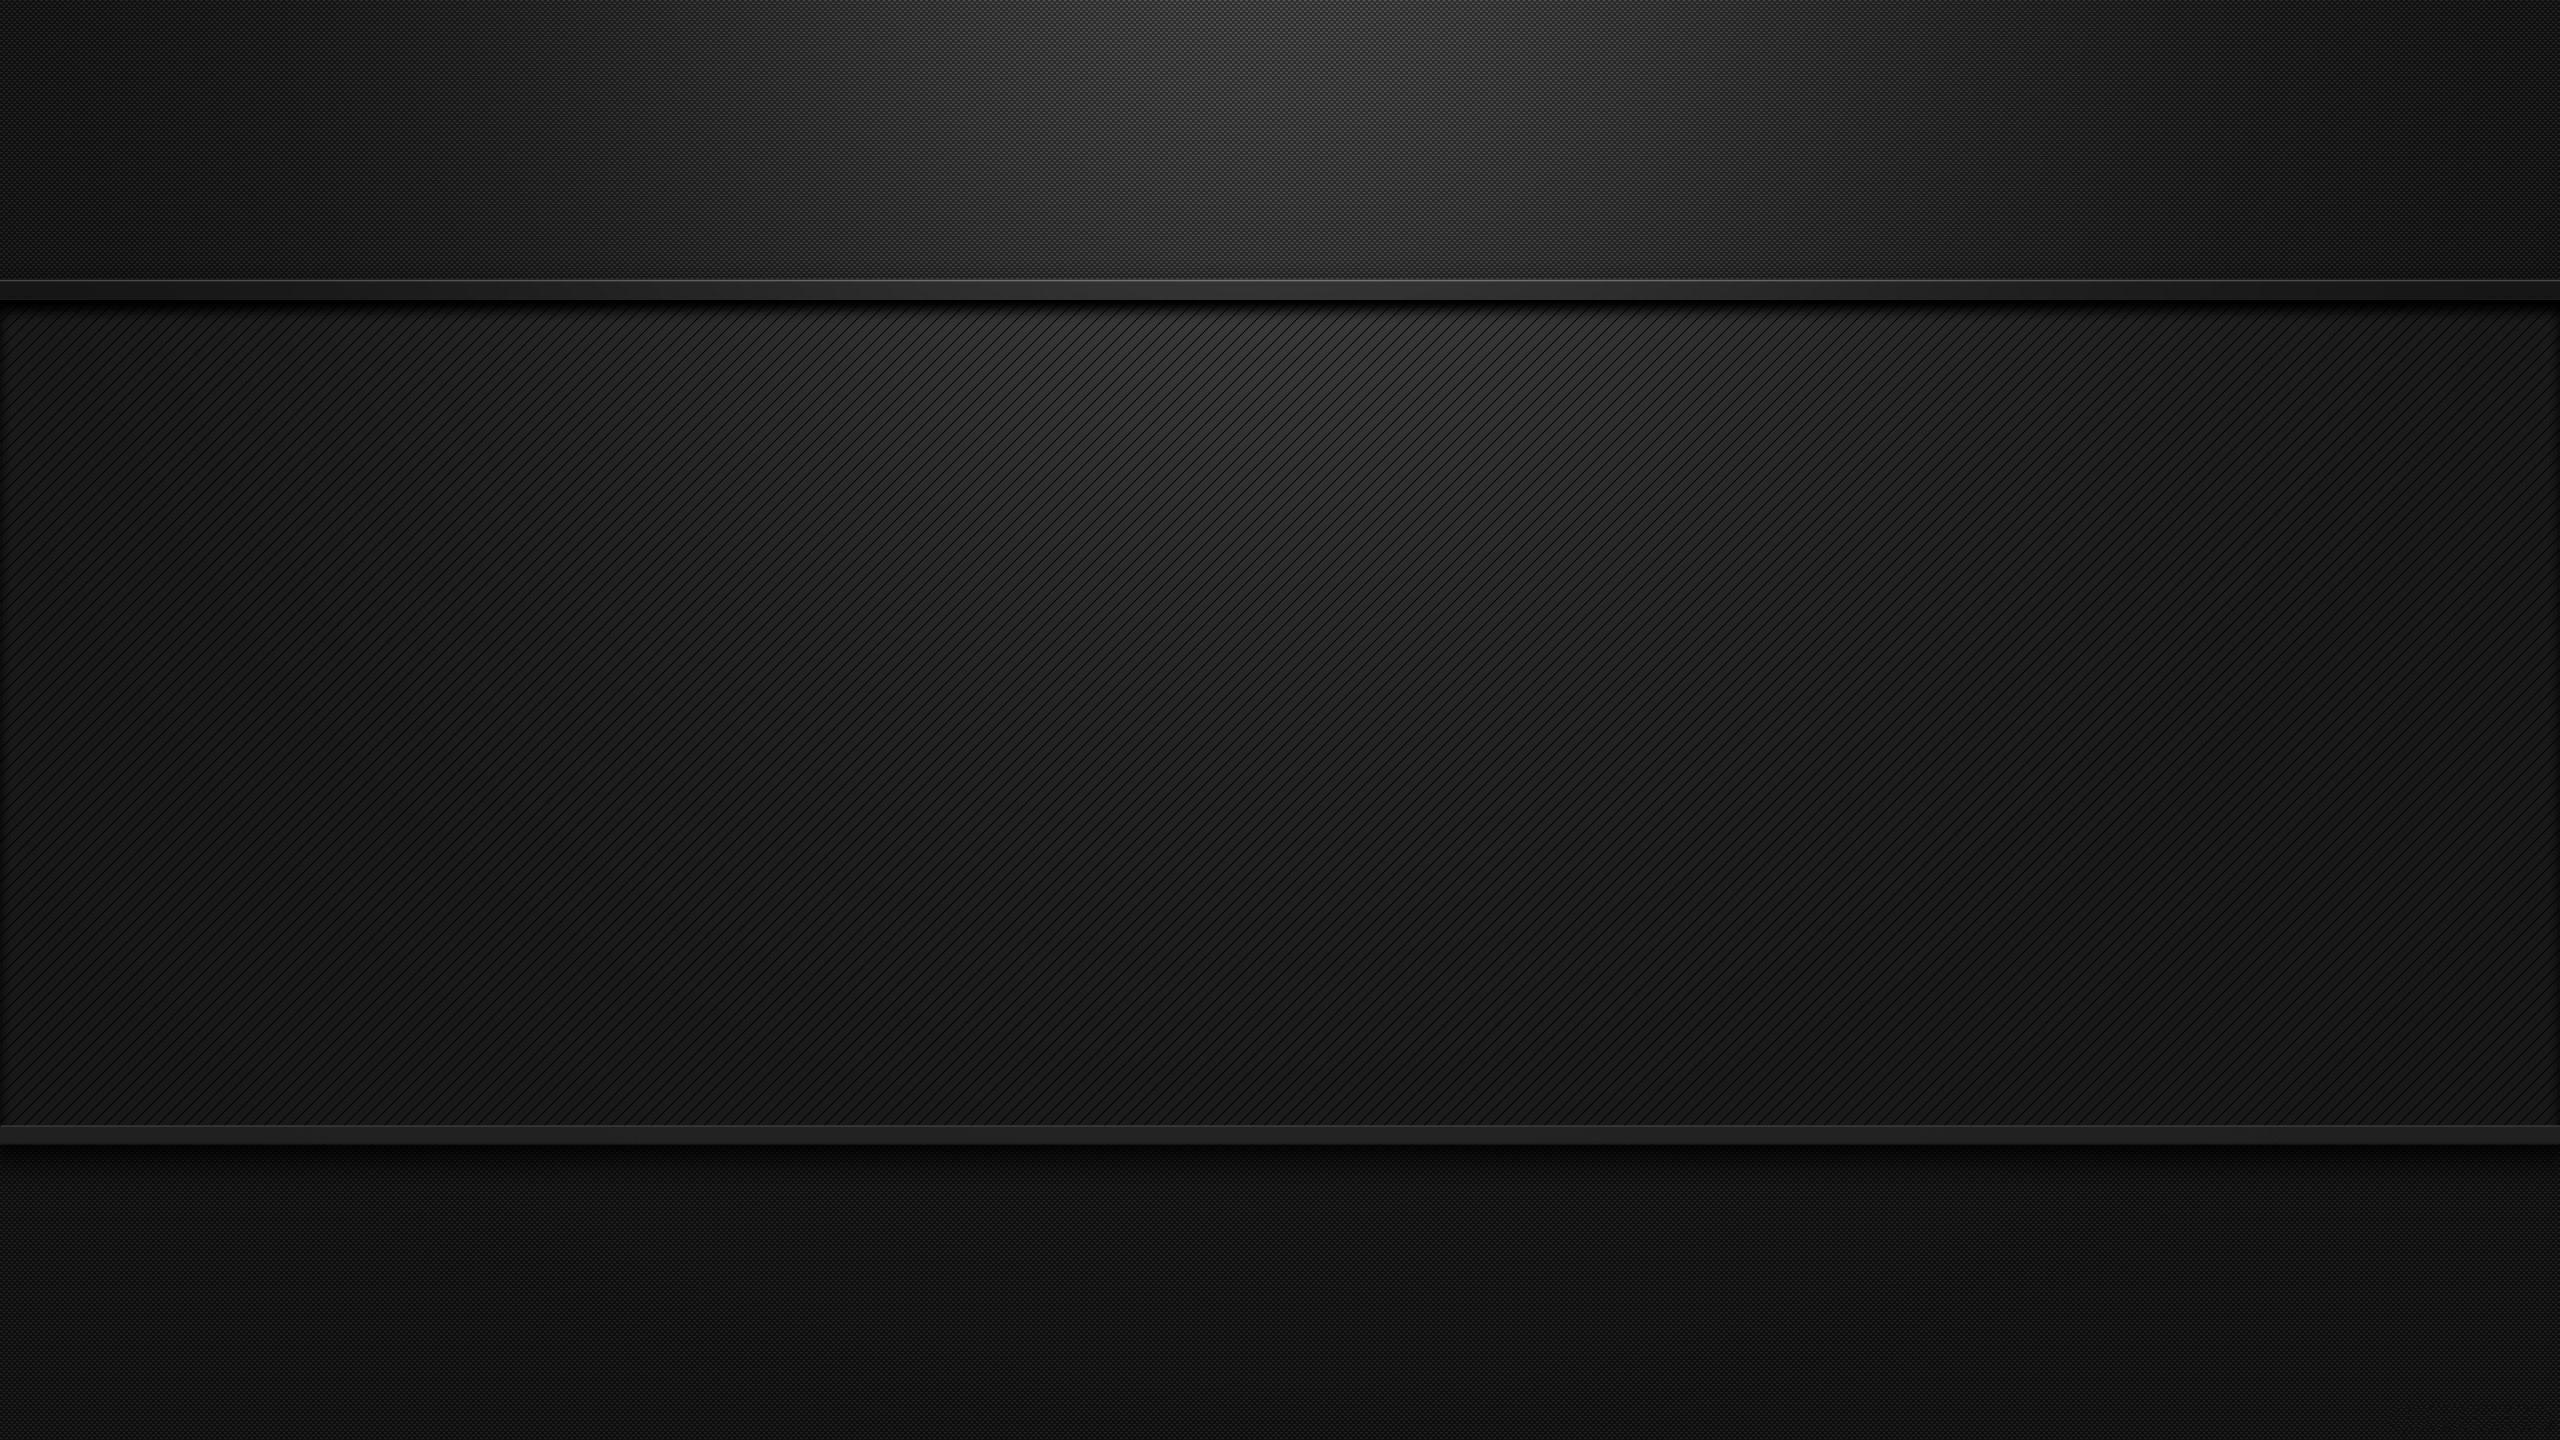 2560X1440 Black Wallpapers - Top Free 2560X1440 Black